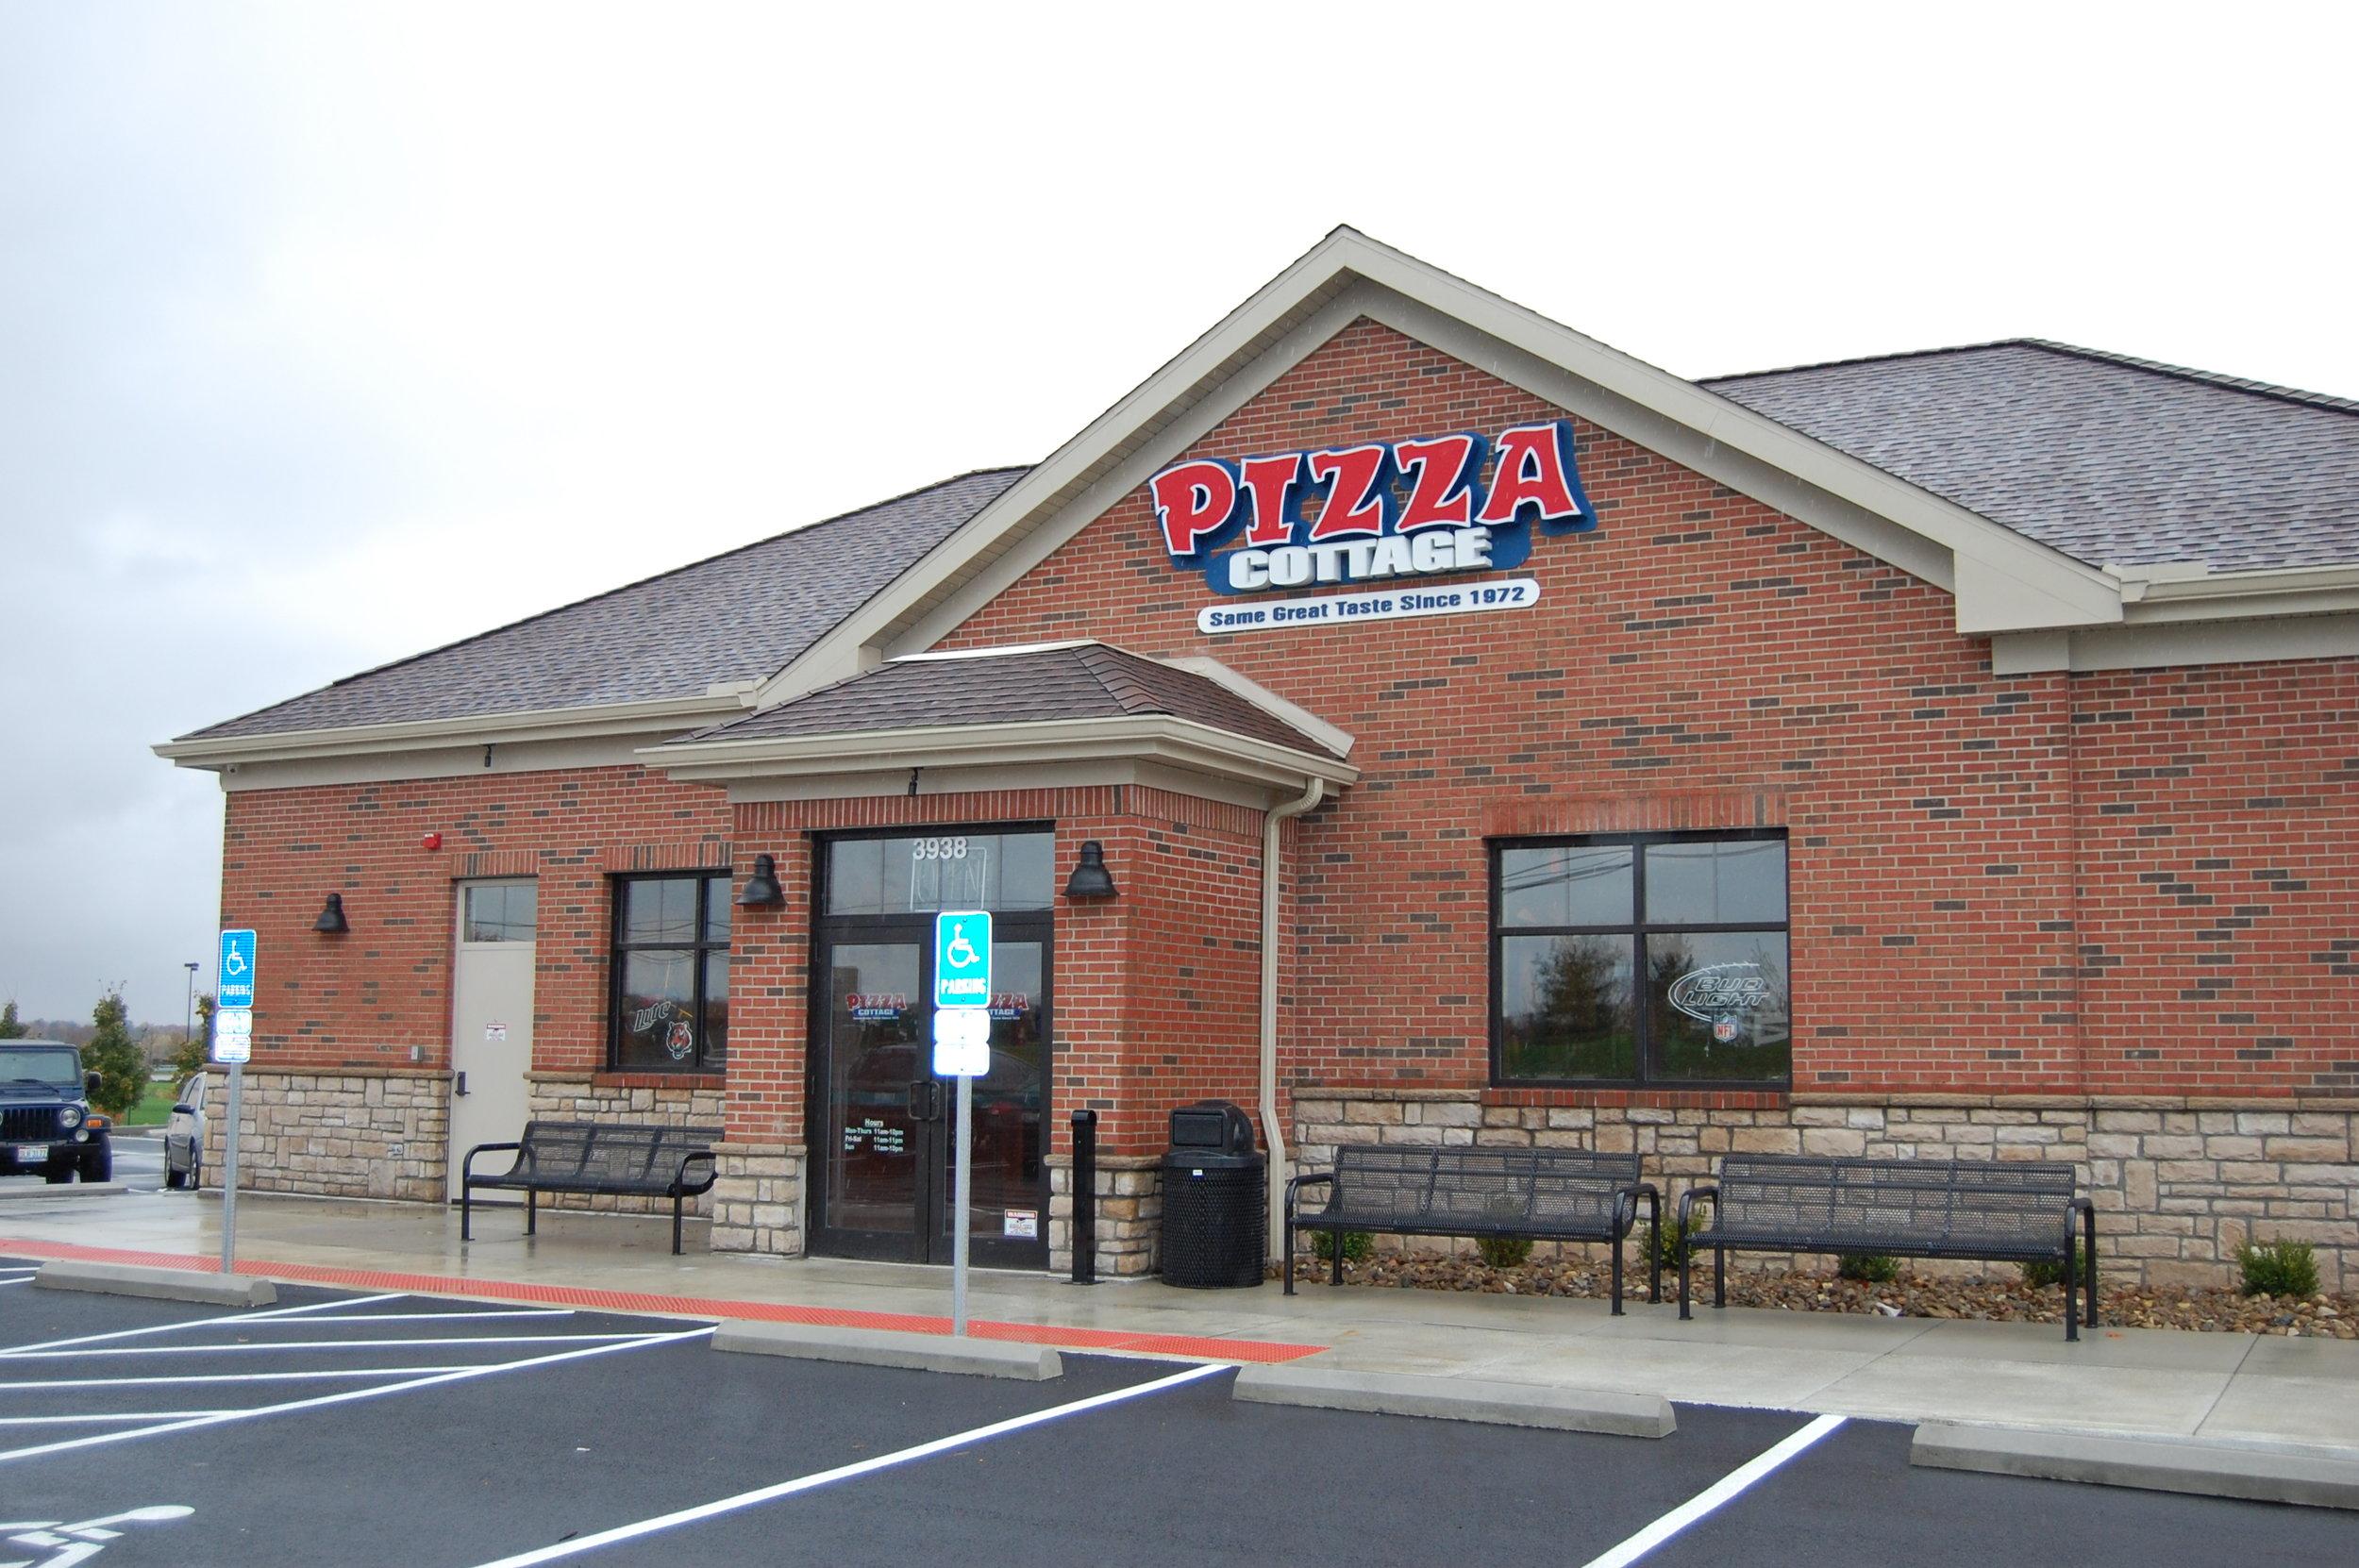 Zanesville Pizza Cottage